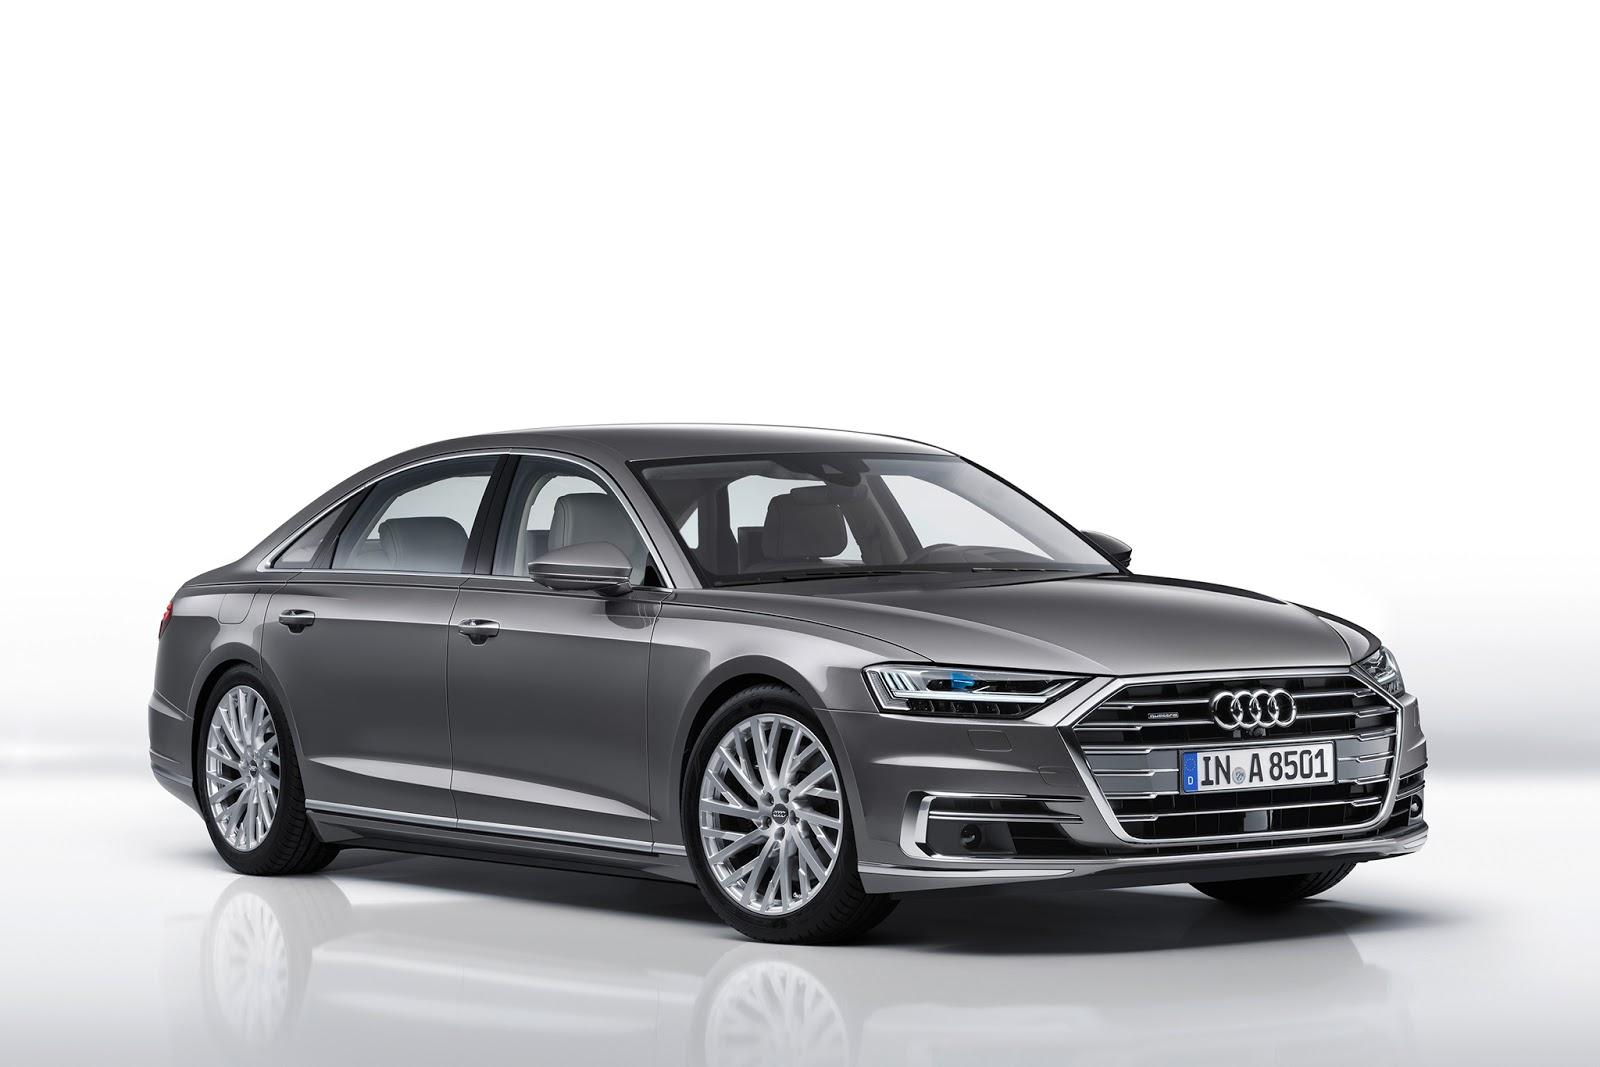 The New 2018 Audi A8 L Long Version